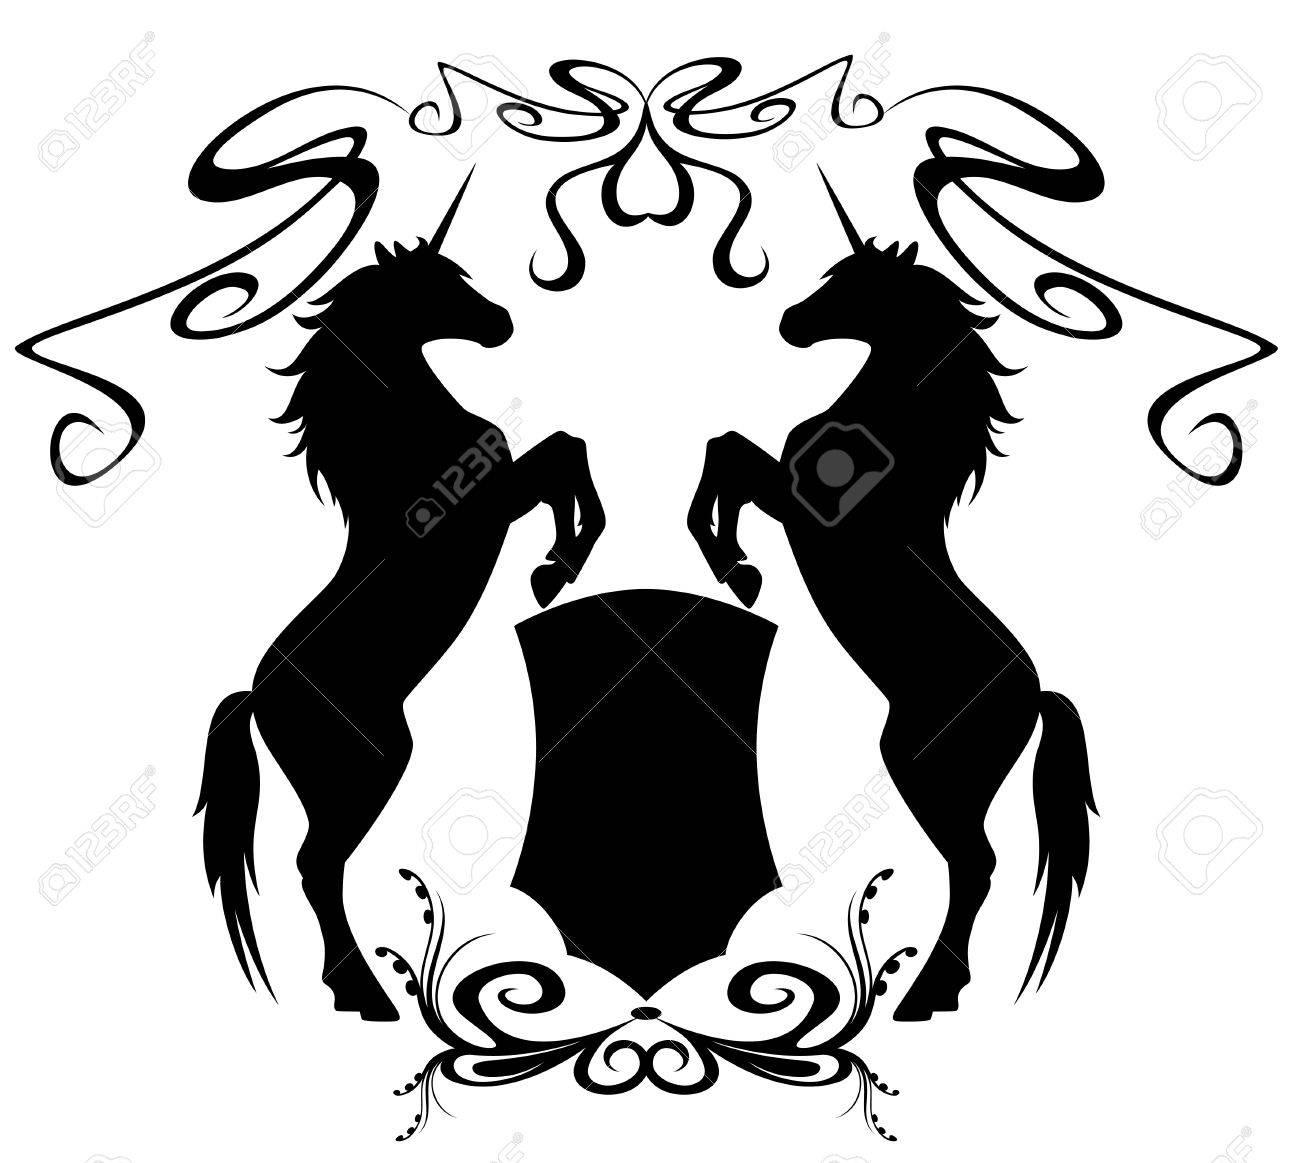 two unicorns holding a shield - heraldic design elements Stock Vector - 10594665